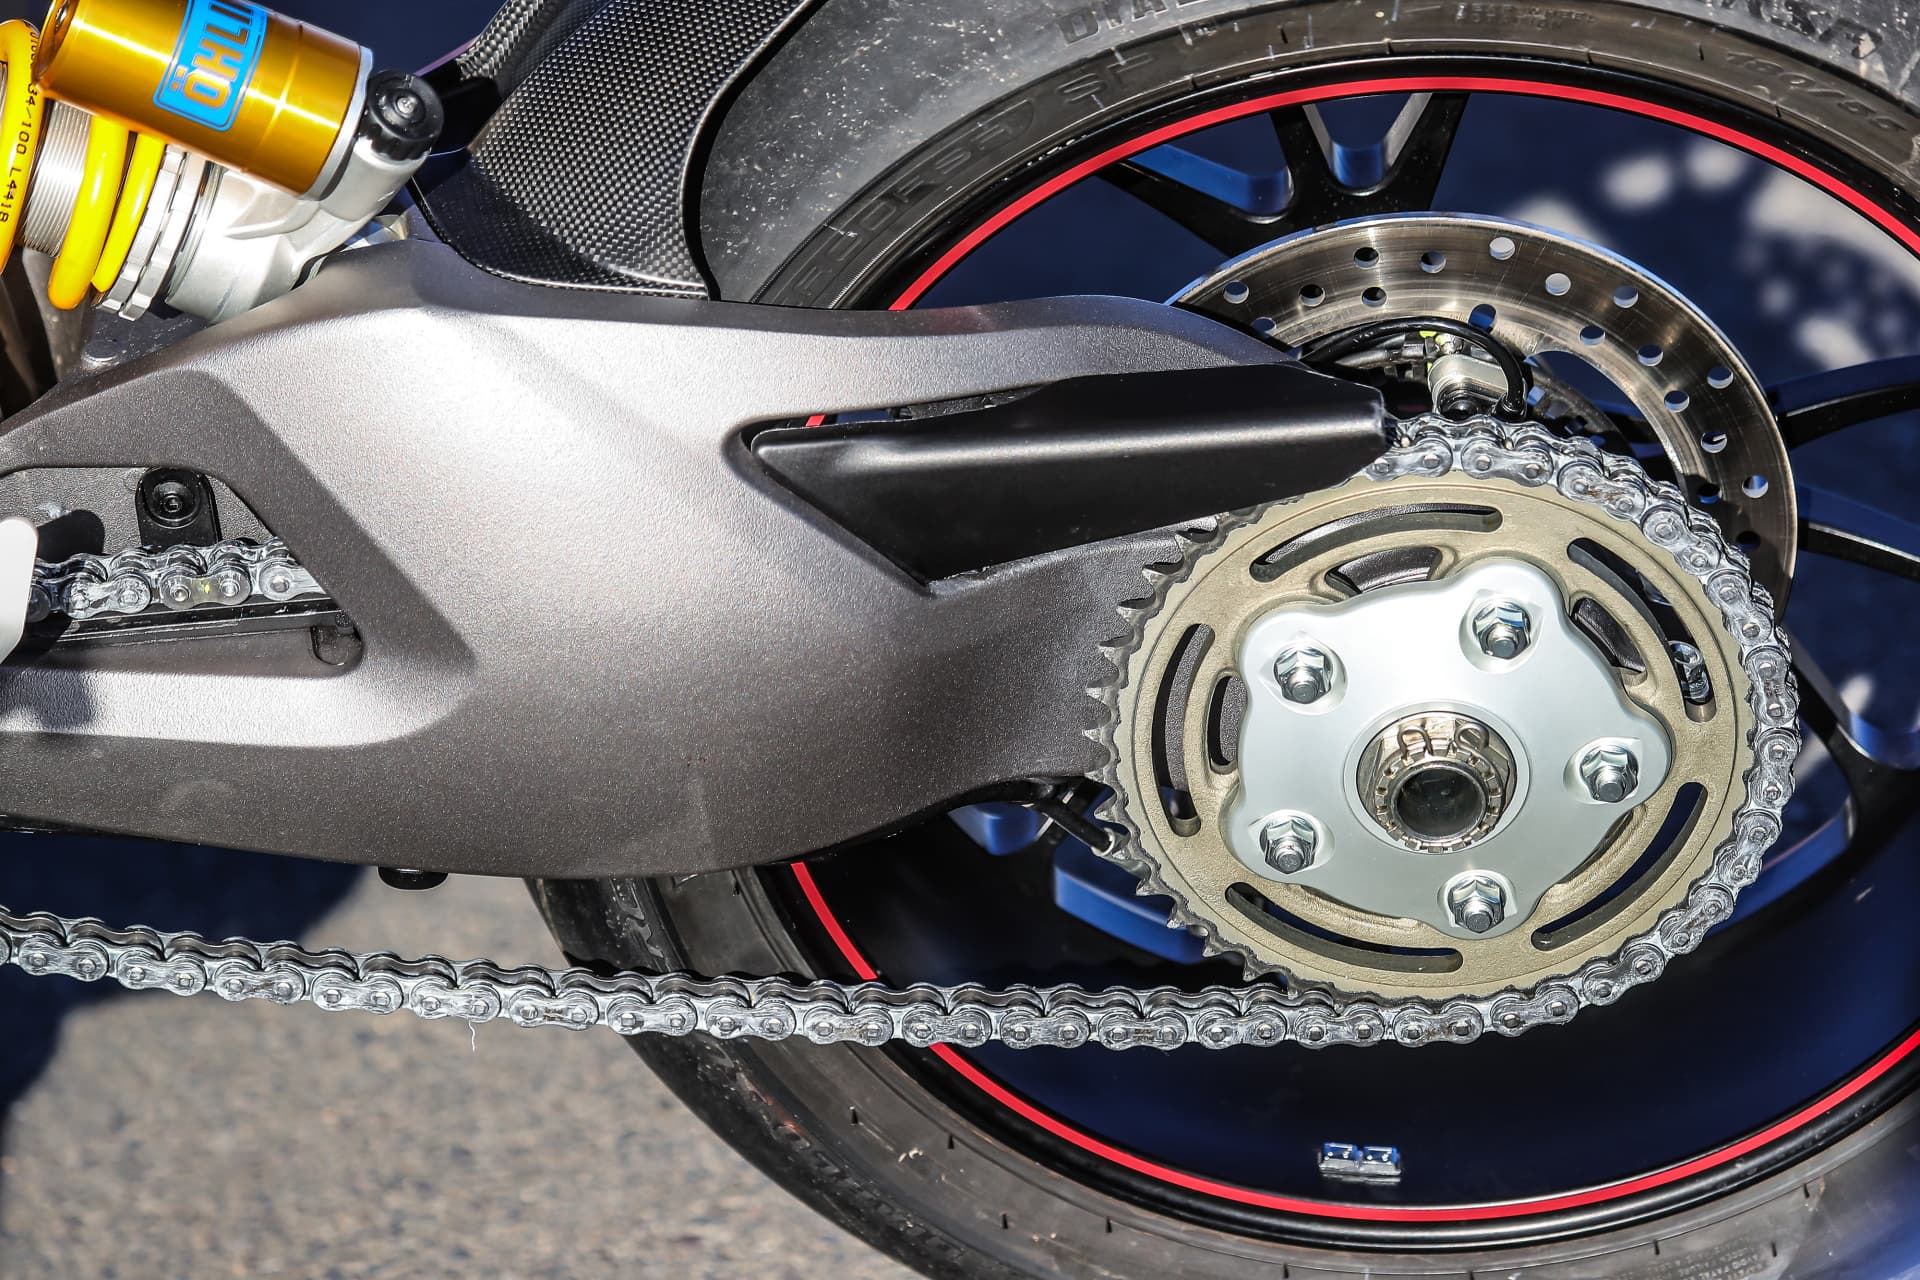 Ducati Hypermotard 950 Sp Static 29 Uc70329 Mid